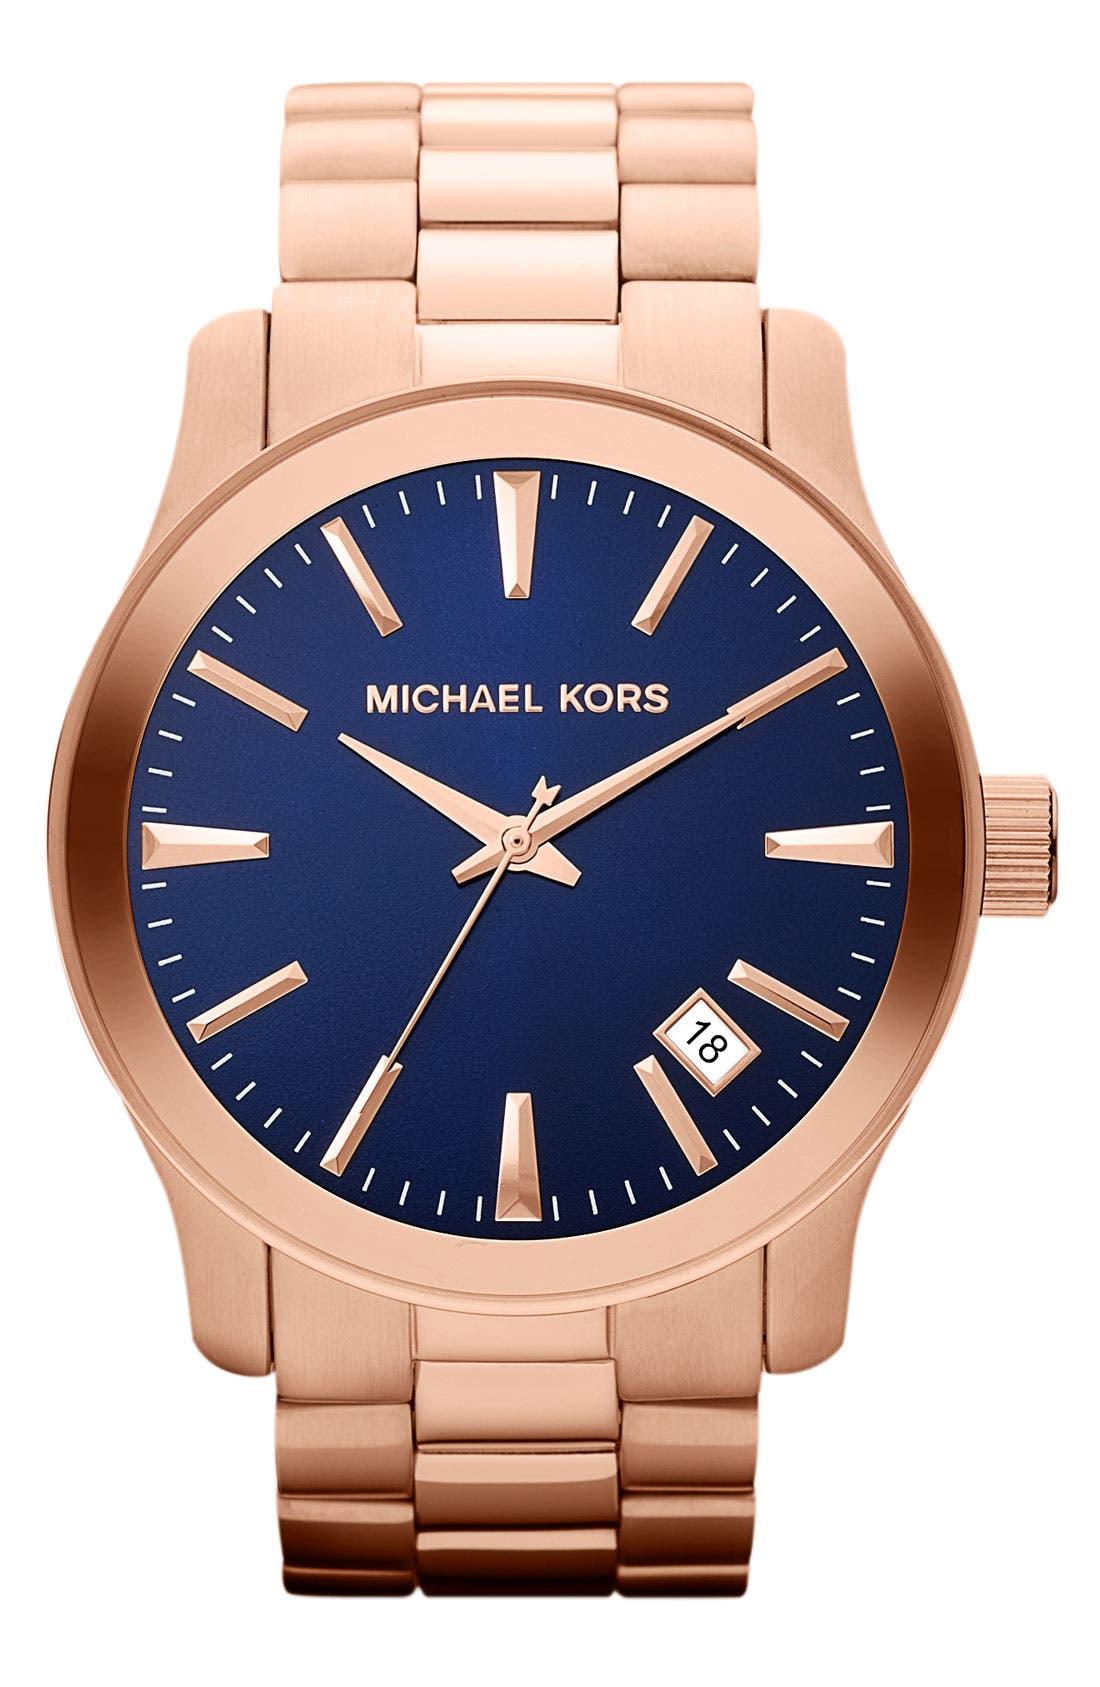 Main Image - Michael Kors 'Large Runway' Blue Dial Bracelet Watch, 45mm